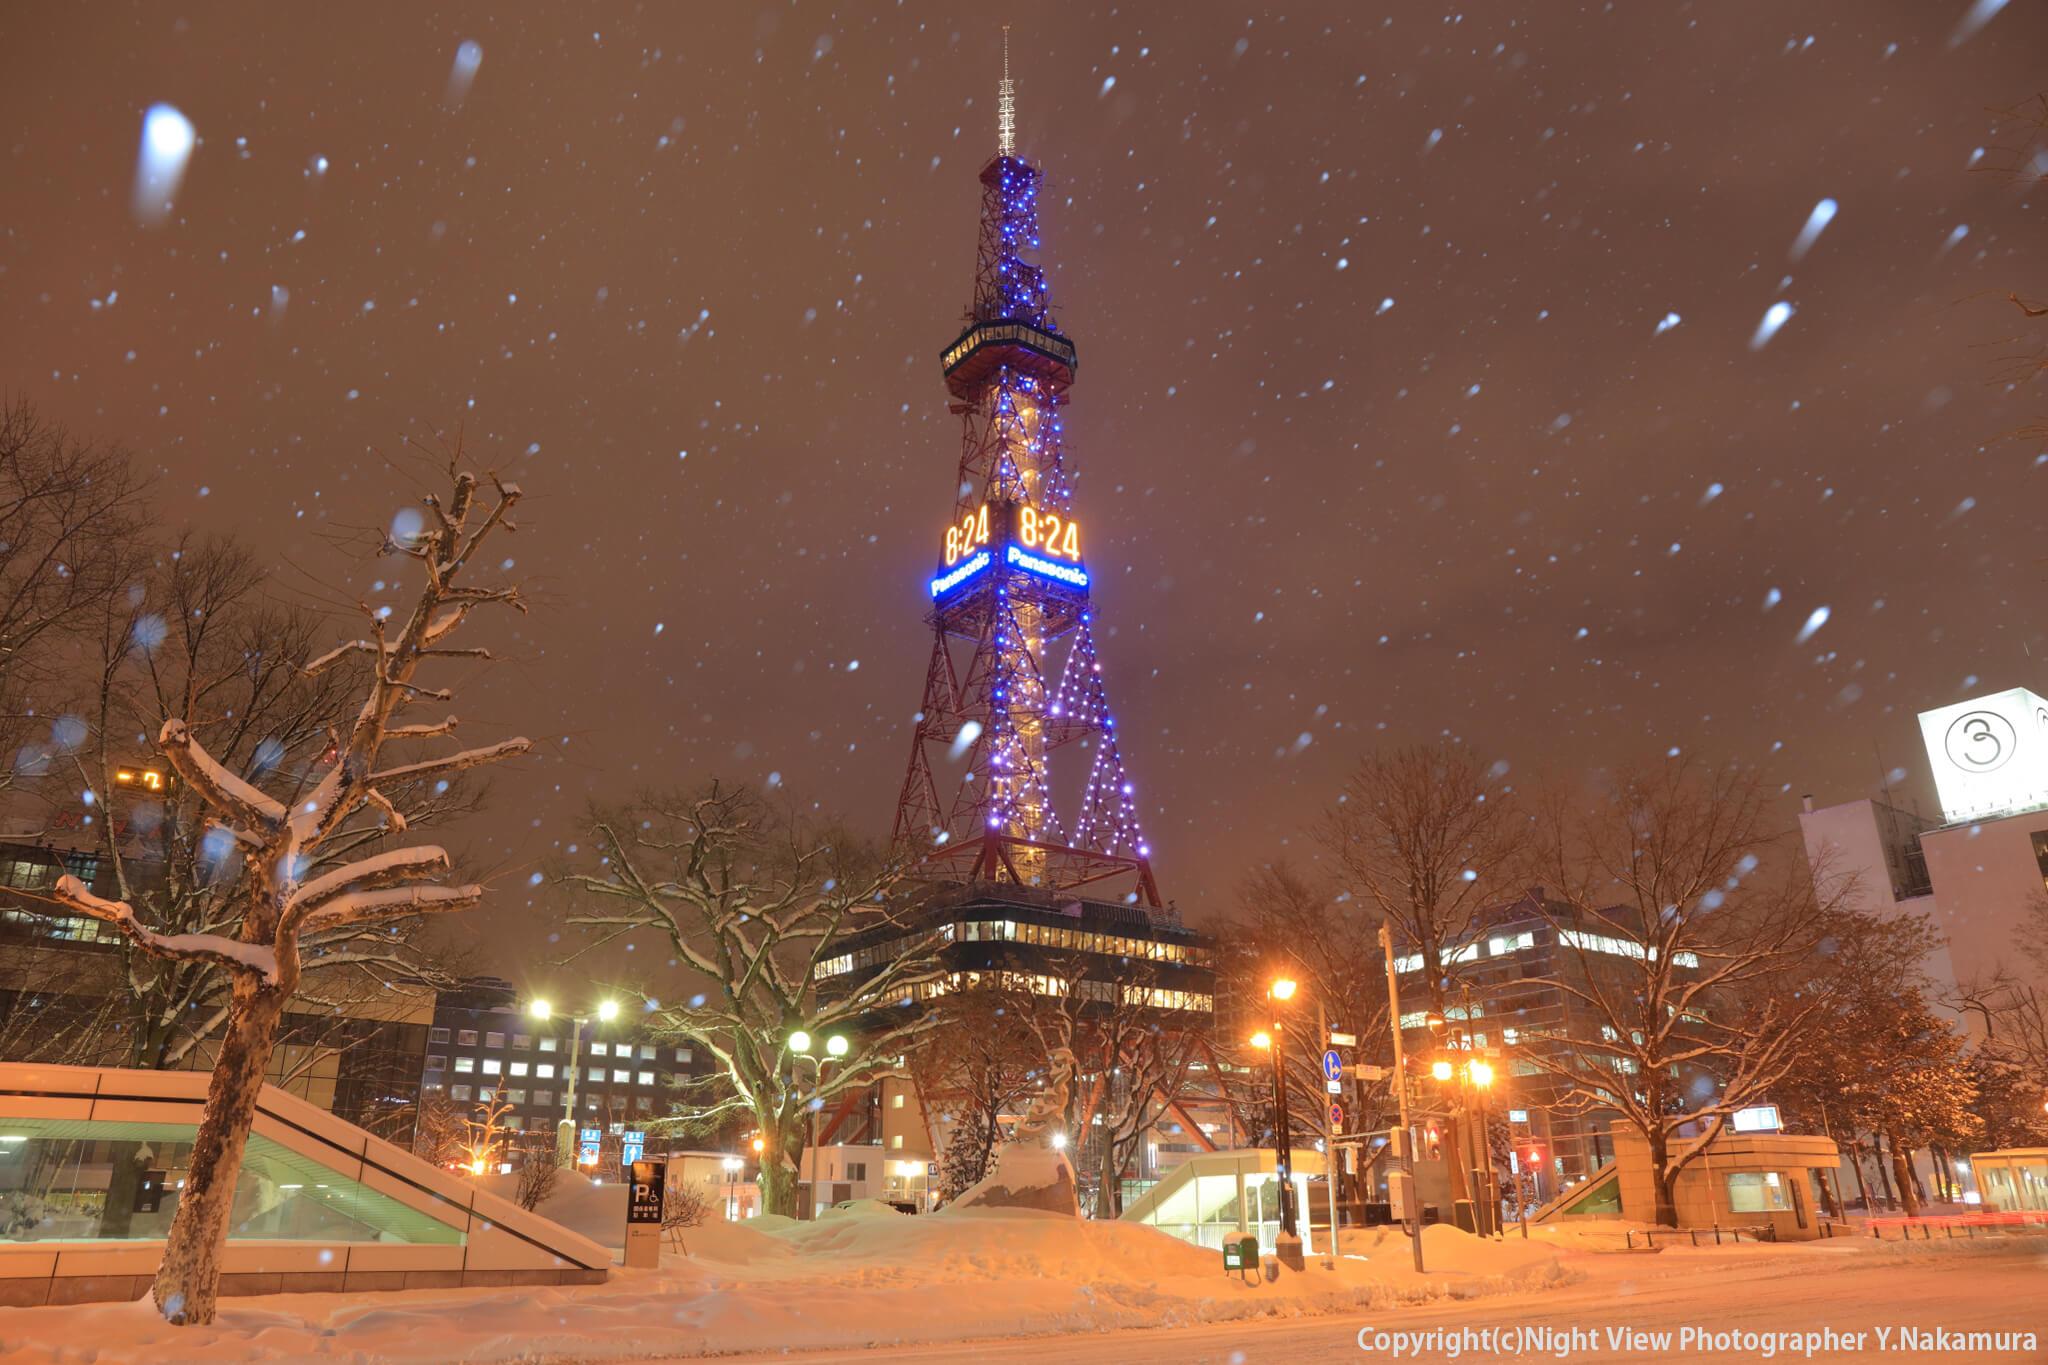 Photo of 大通公園にそびえる札幌のシンボル「さっぽろテレビ塔」